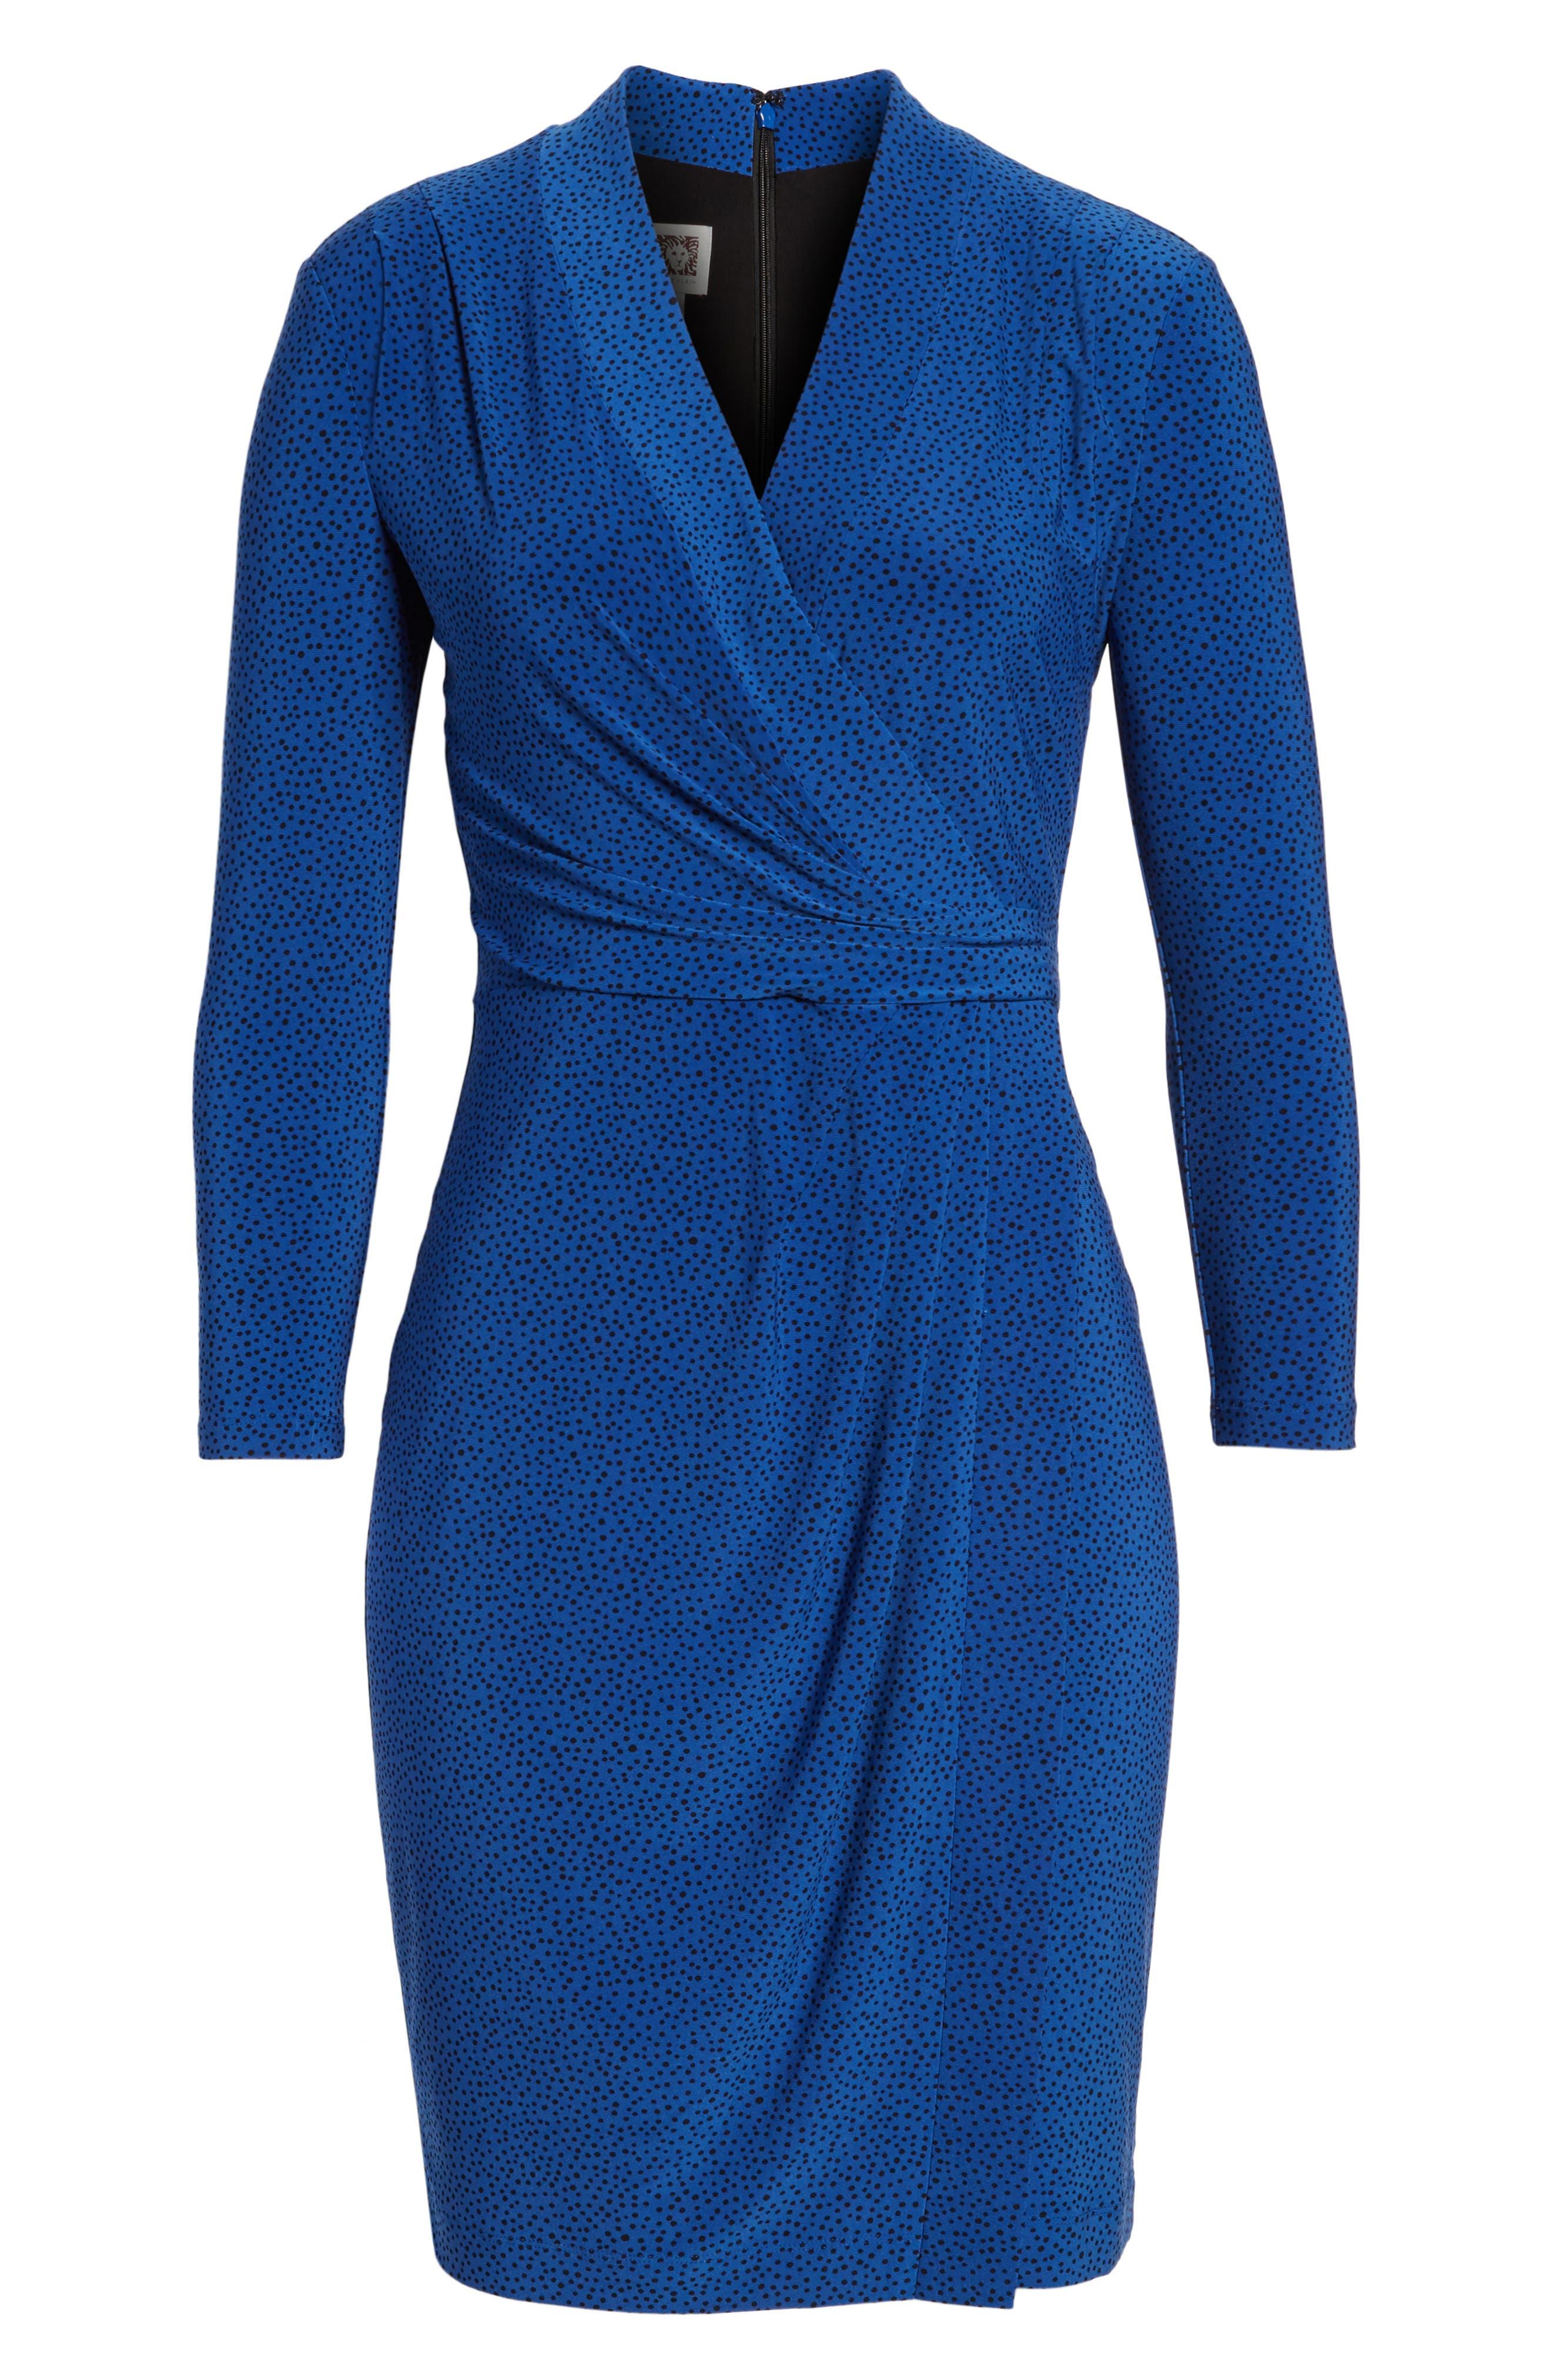 City Faux Wrap Dress,                             Alternate thumbnail 6, color,                             Mariner/ Black